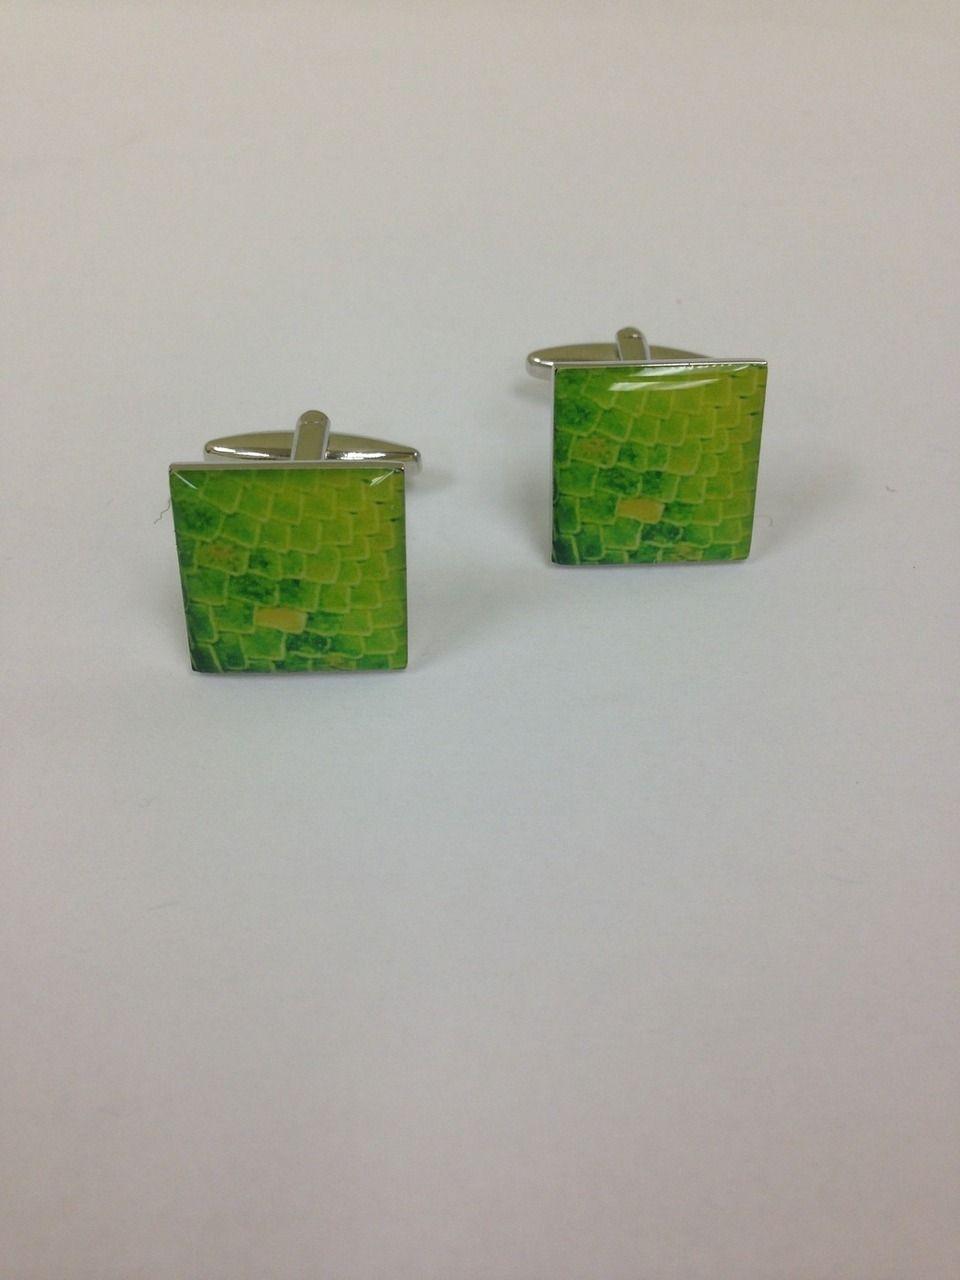 2 Pc. Gator Print Green Design Cufflinks